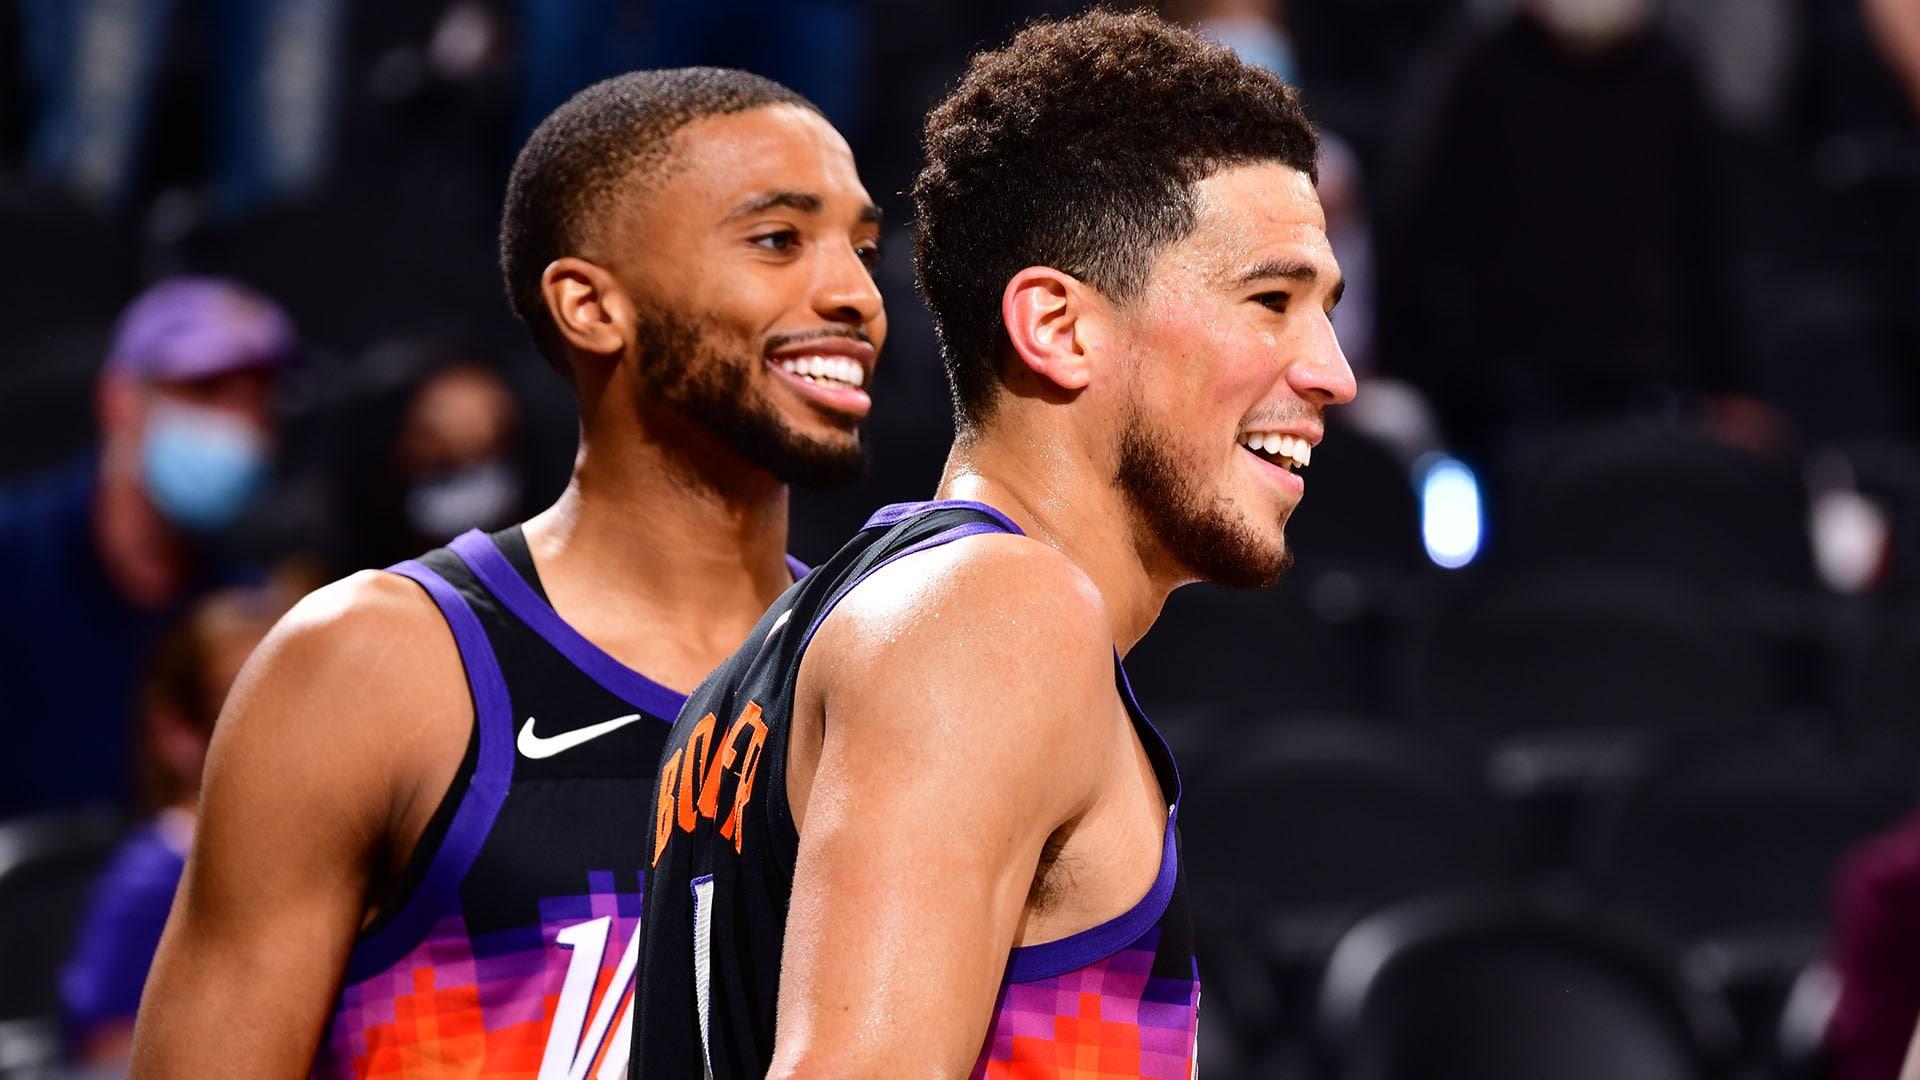 Power Rankings, Week 20: Suns, Sixers on rise in season's final 2 weeks